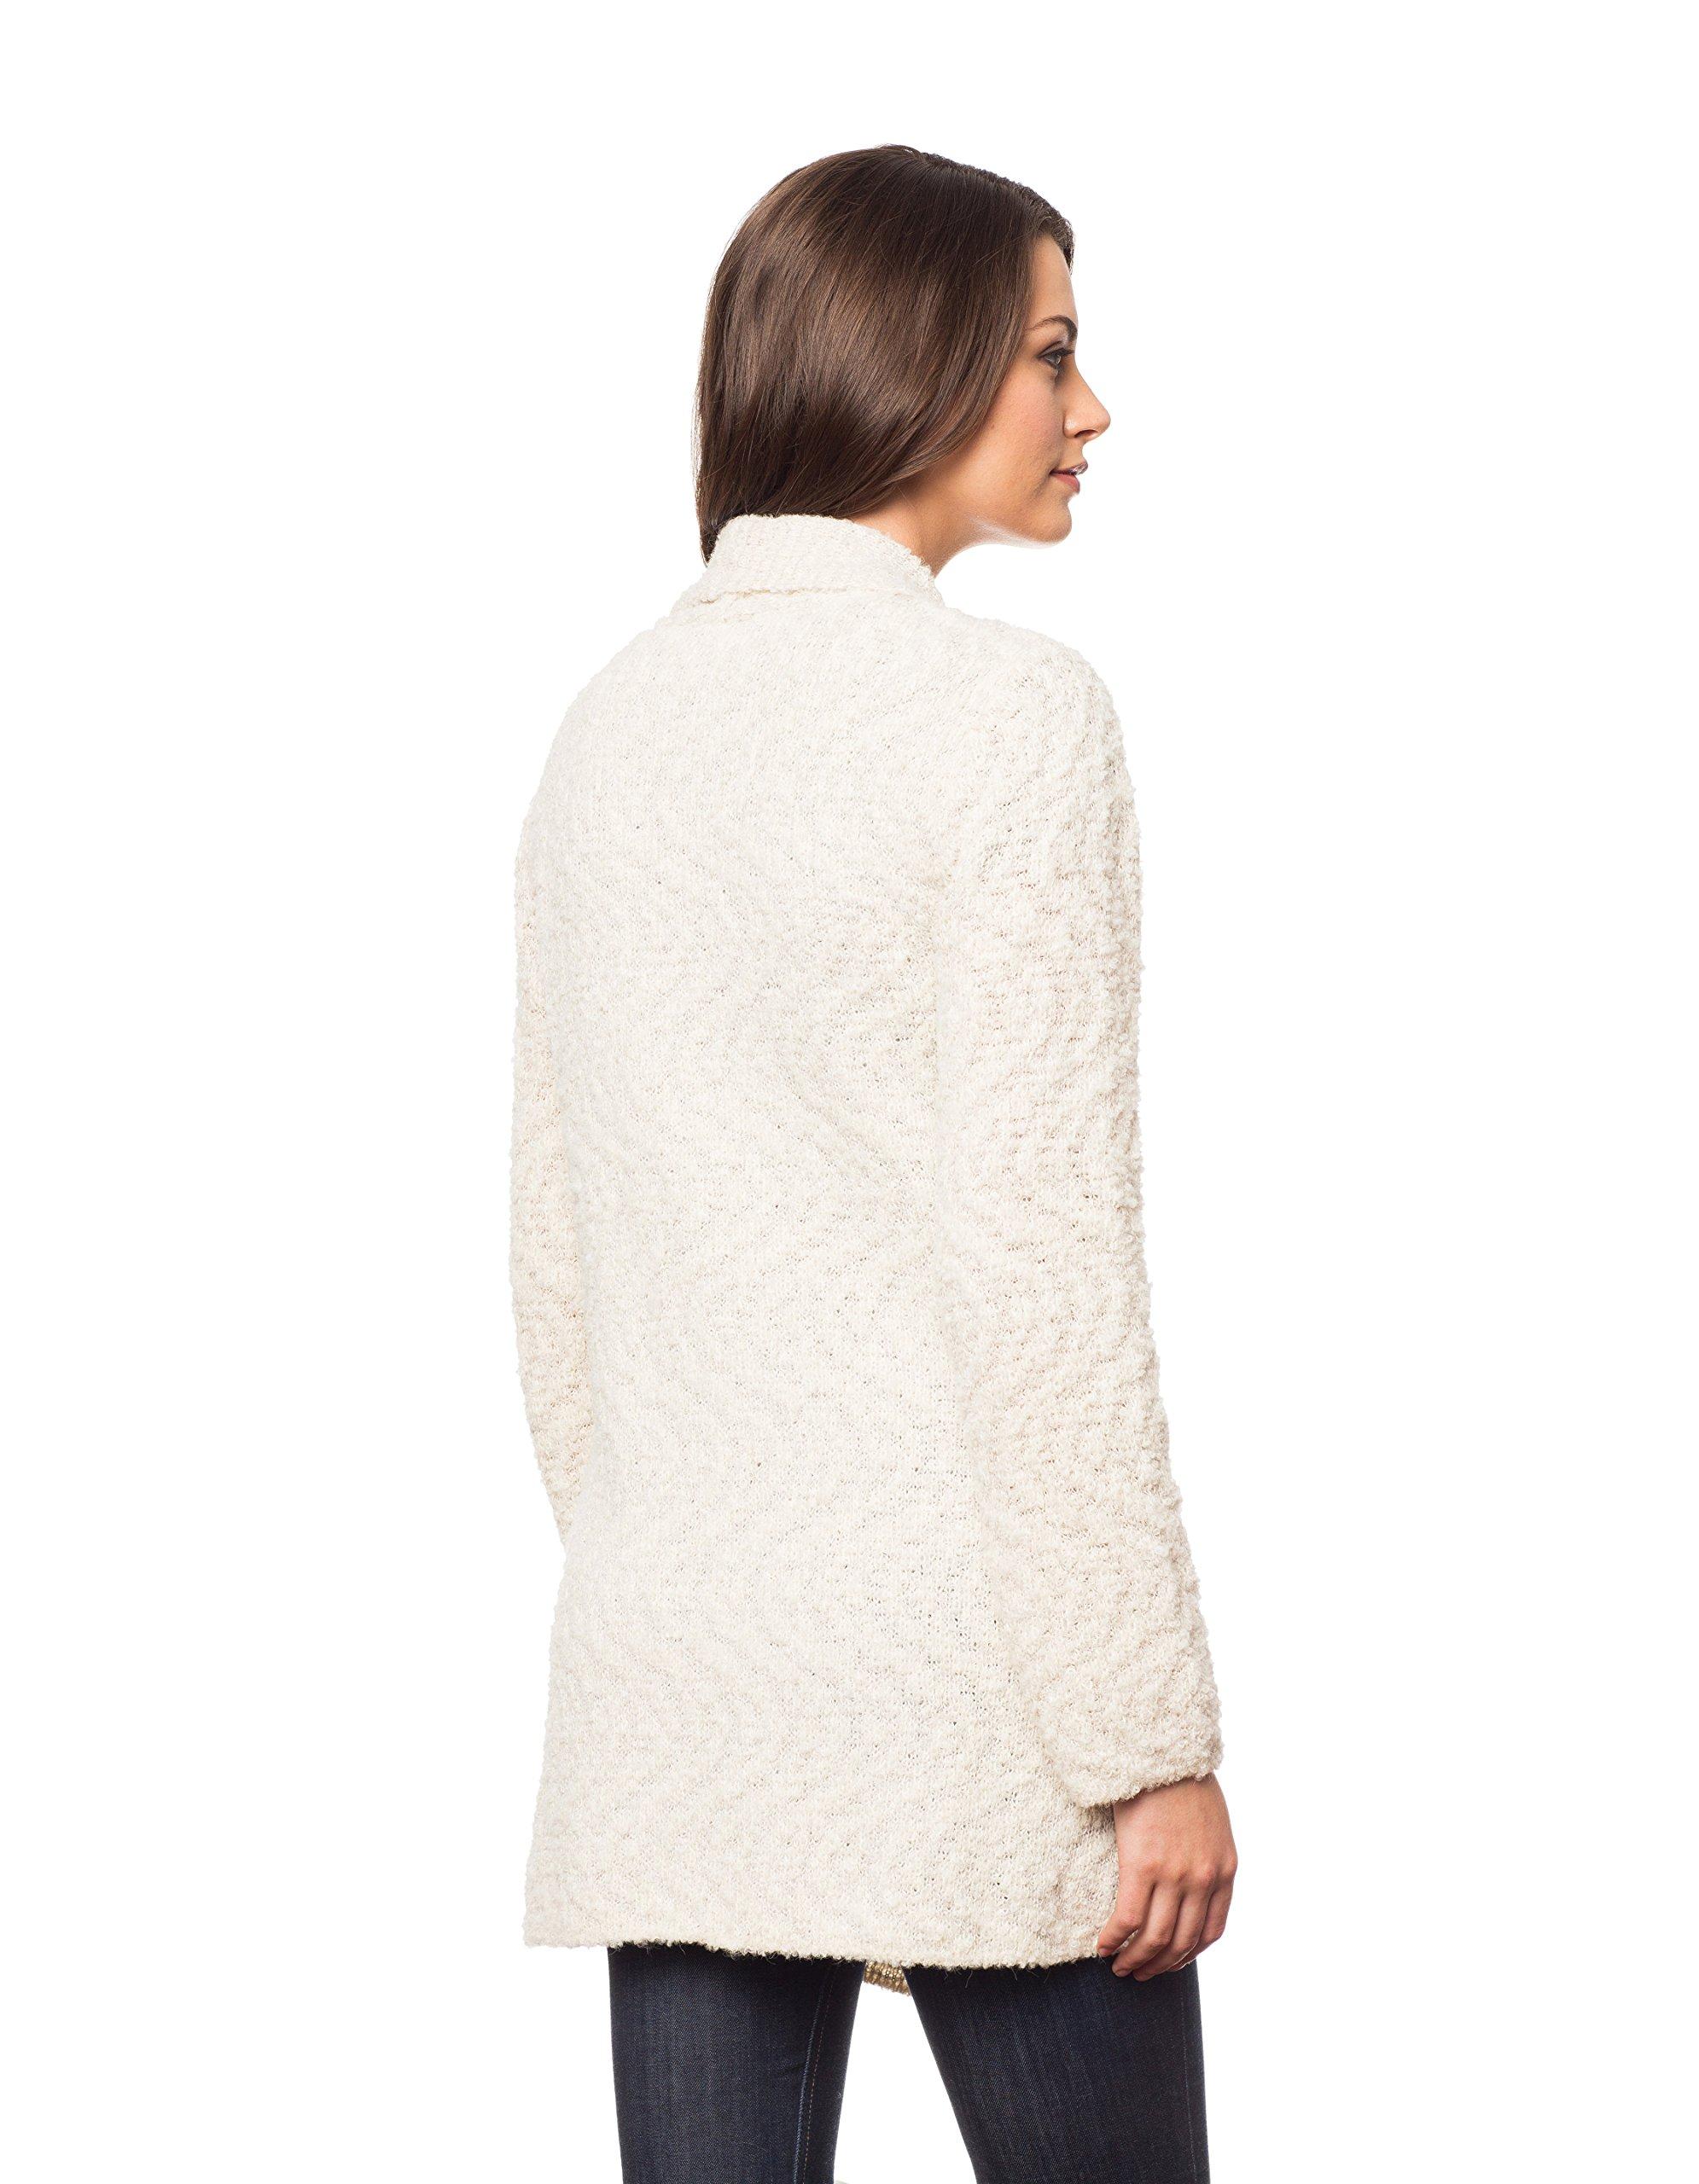 Invisible World Womens Alpaca/Pima Cotton Blend Womens Sweater Coat Cardigan Swirl - Medium by Invisible World (Image #5)